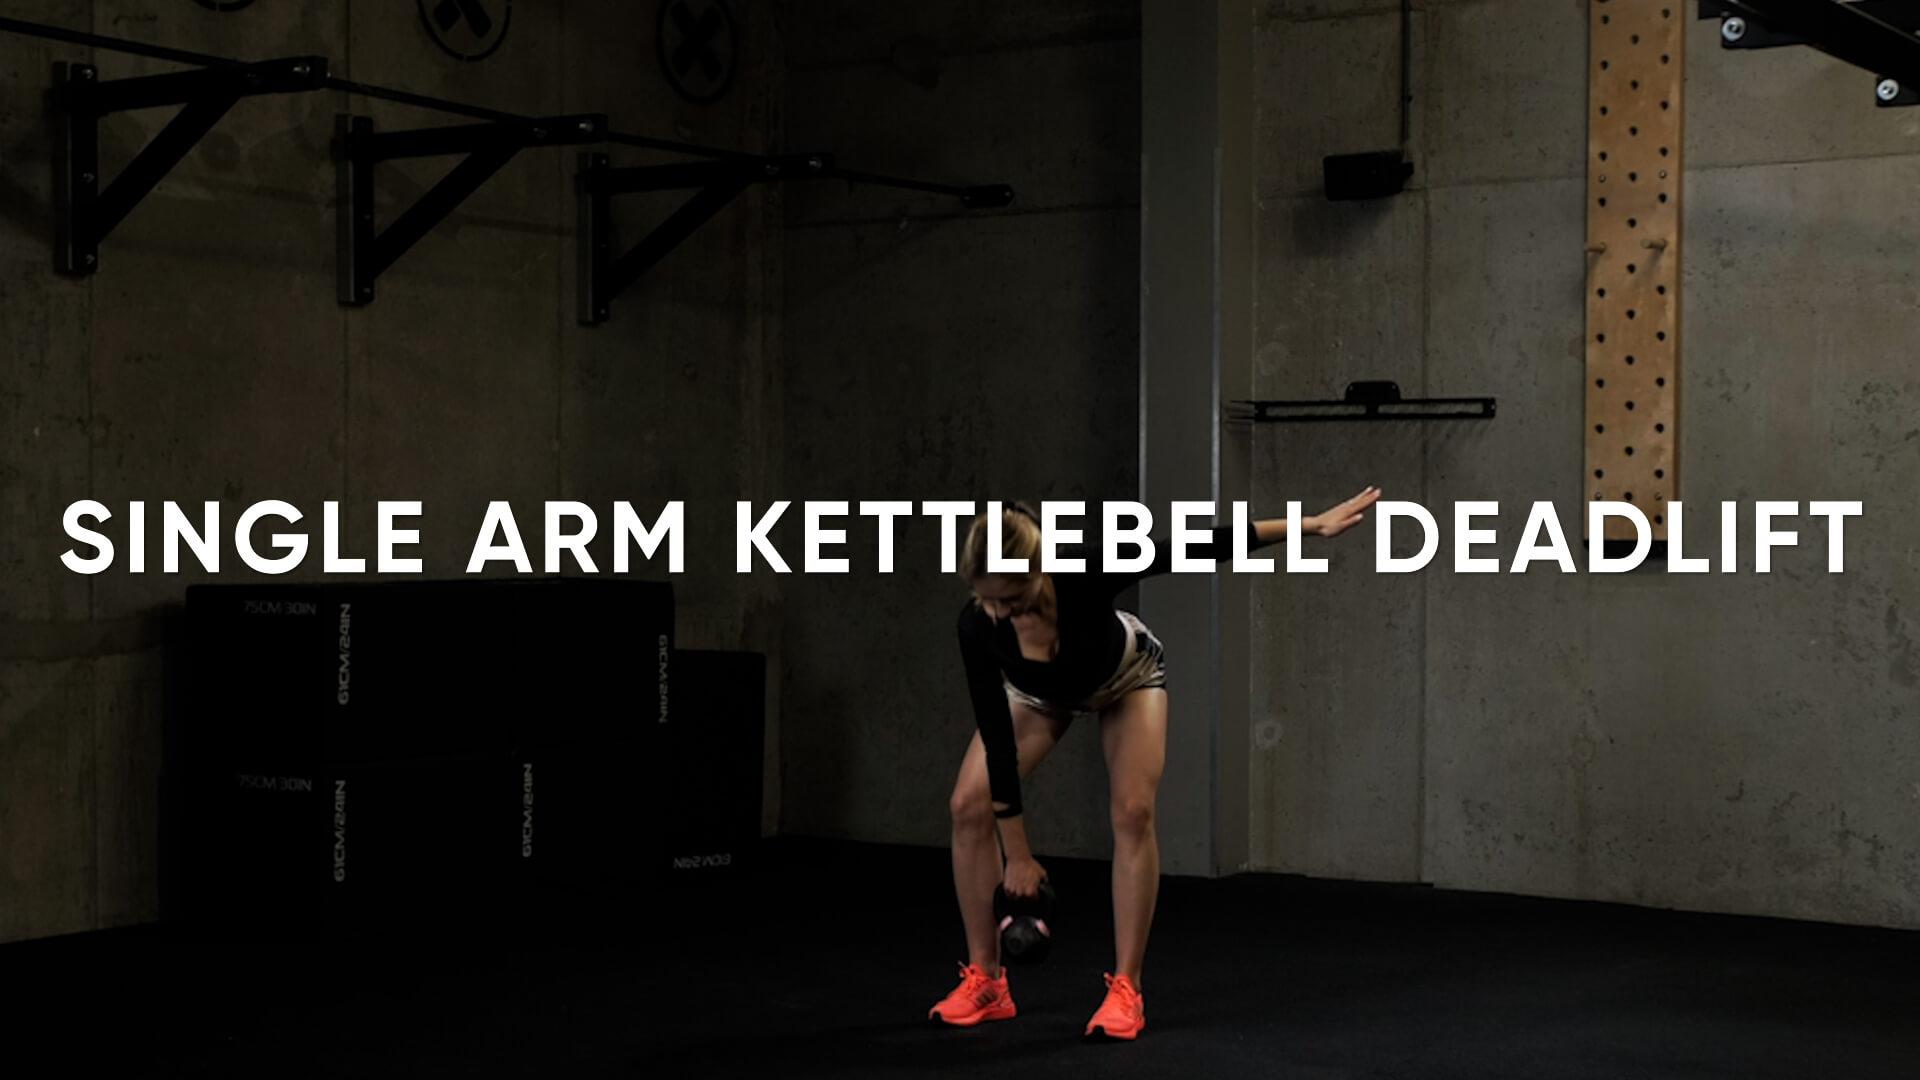 Single Arm Kettlebell Deadlift